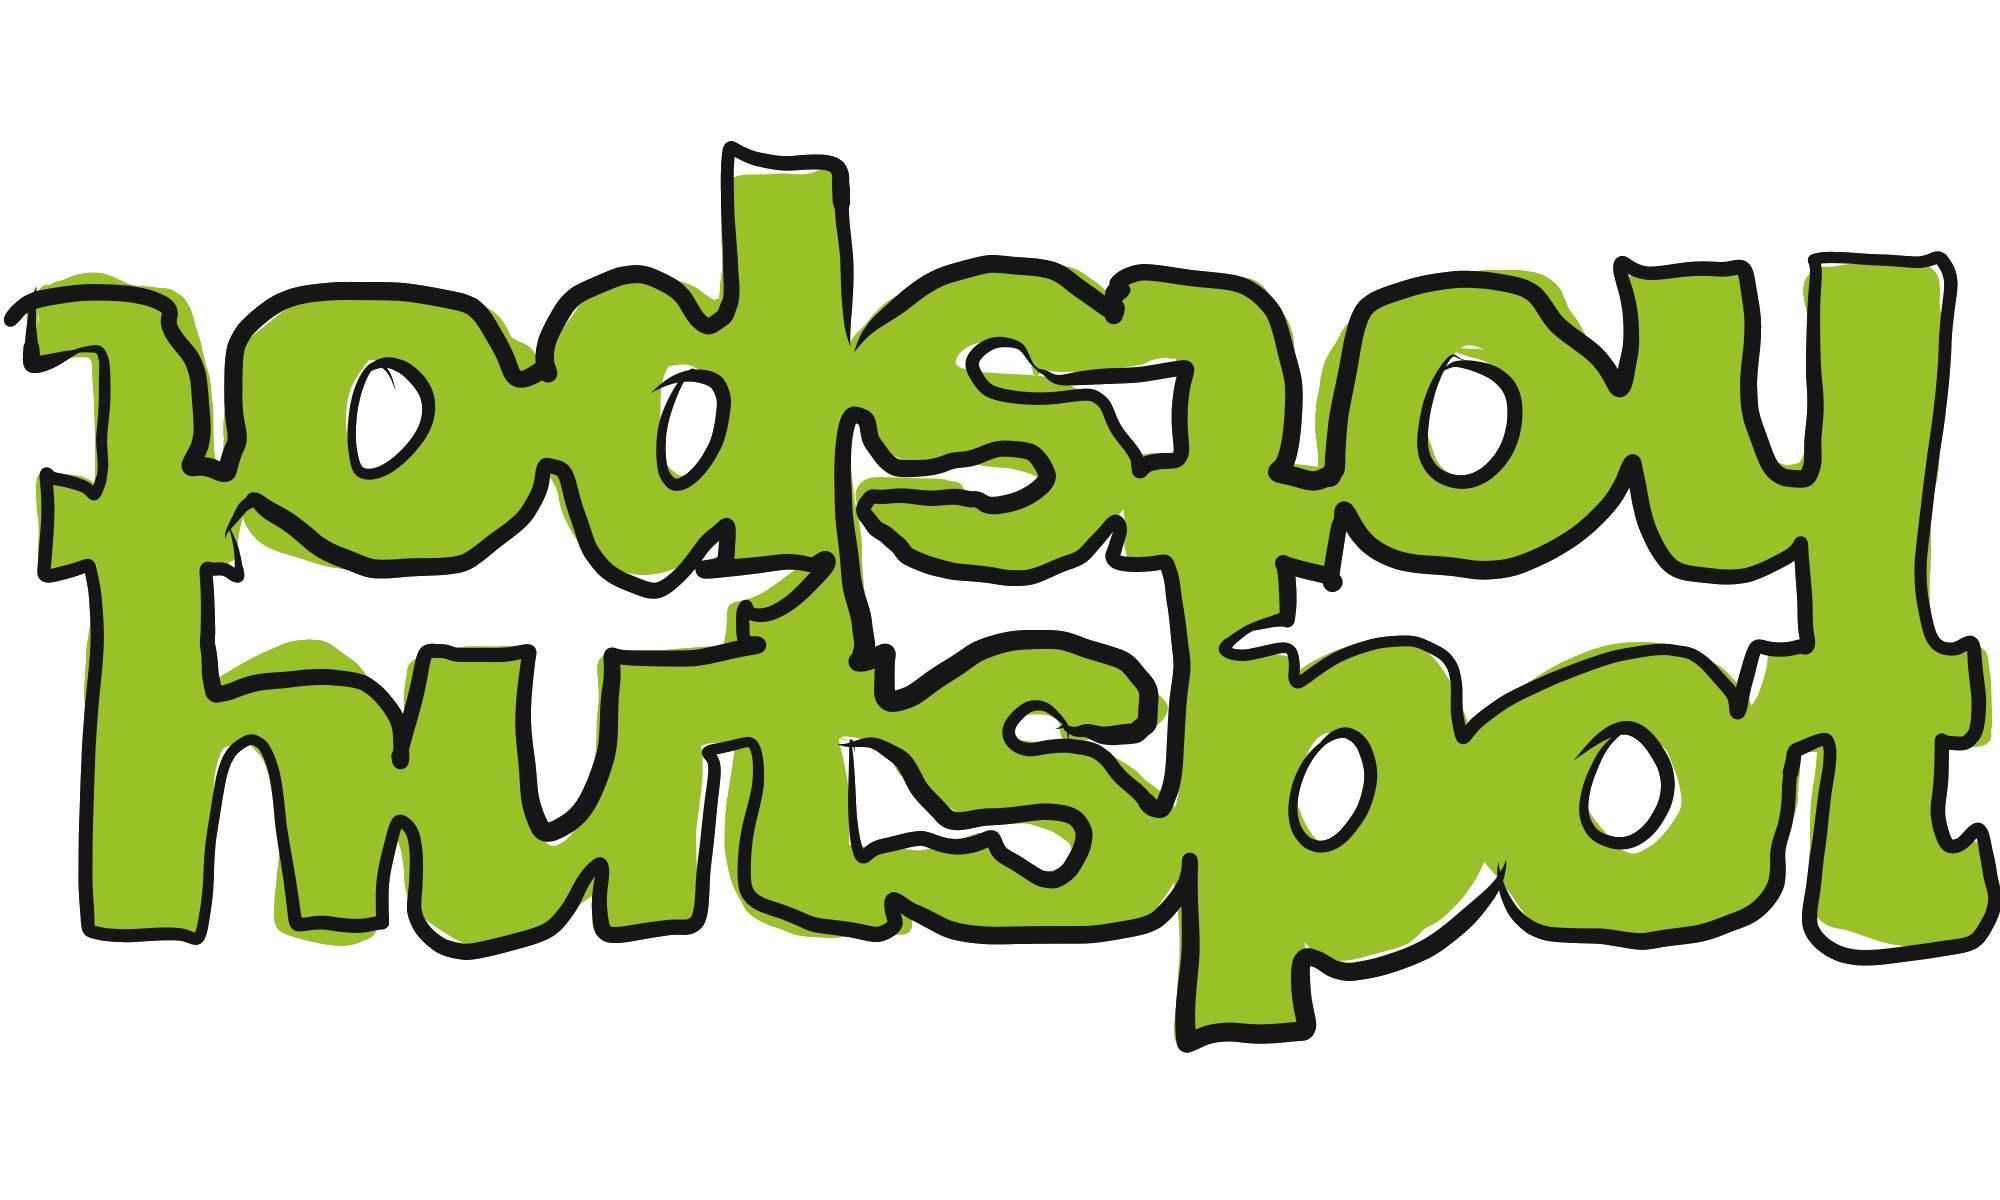 hotspot hutspot